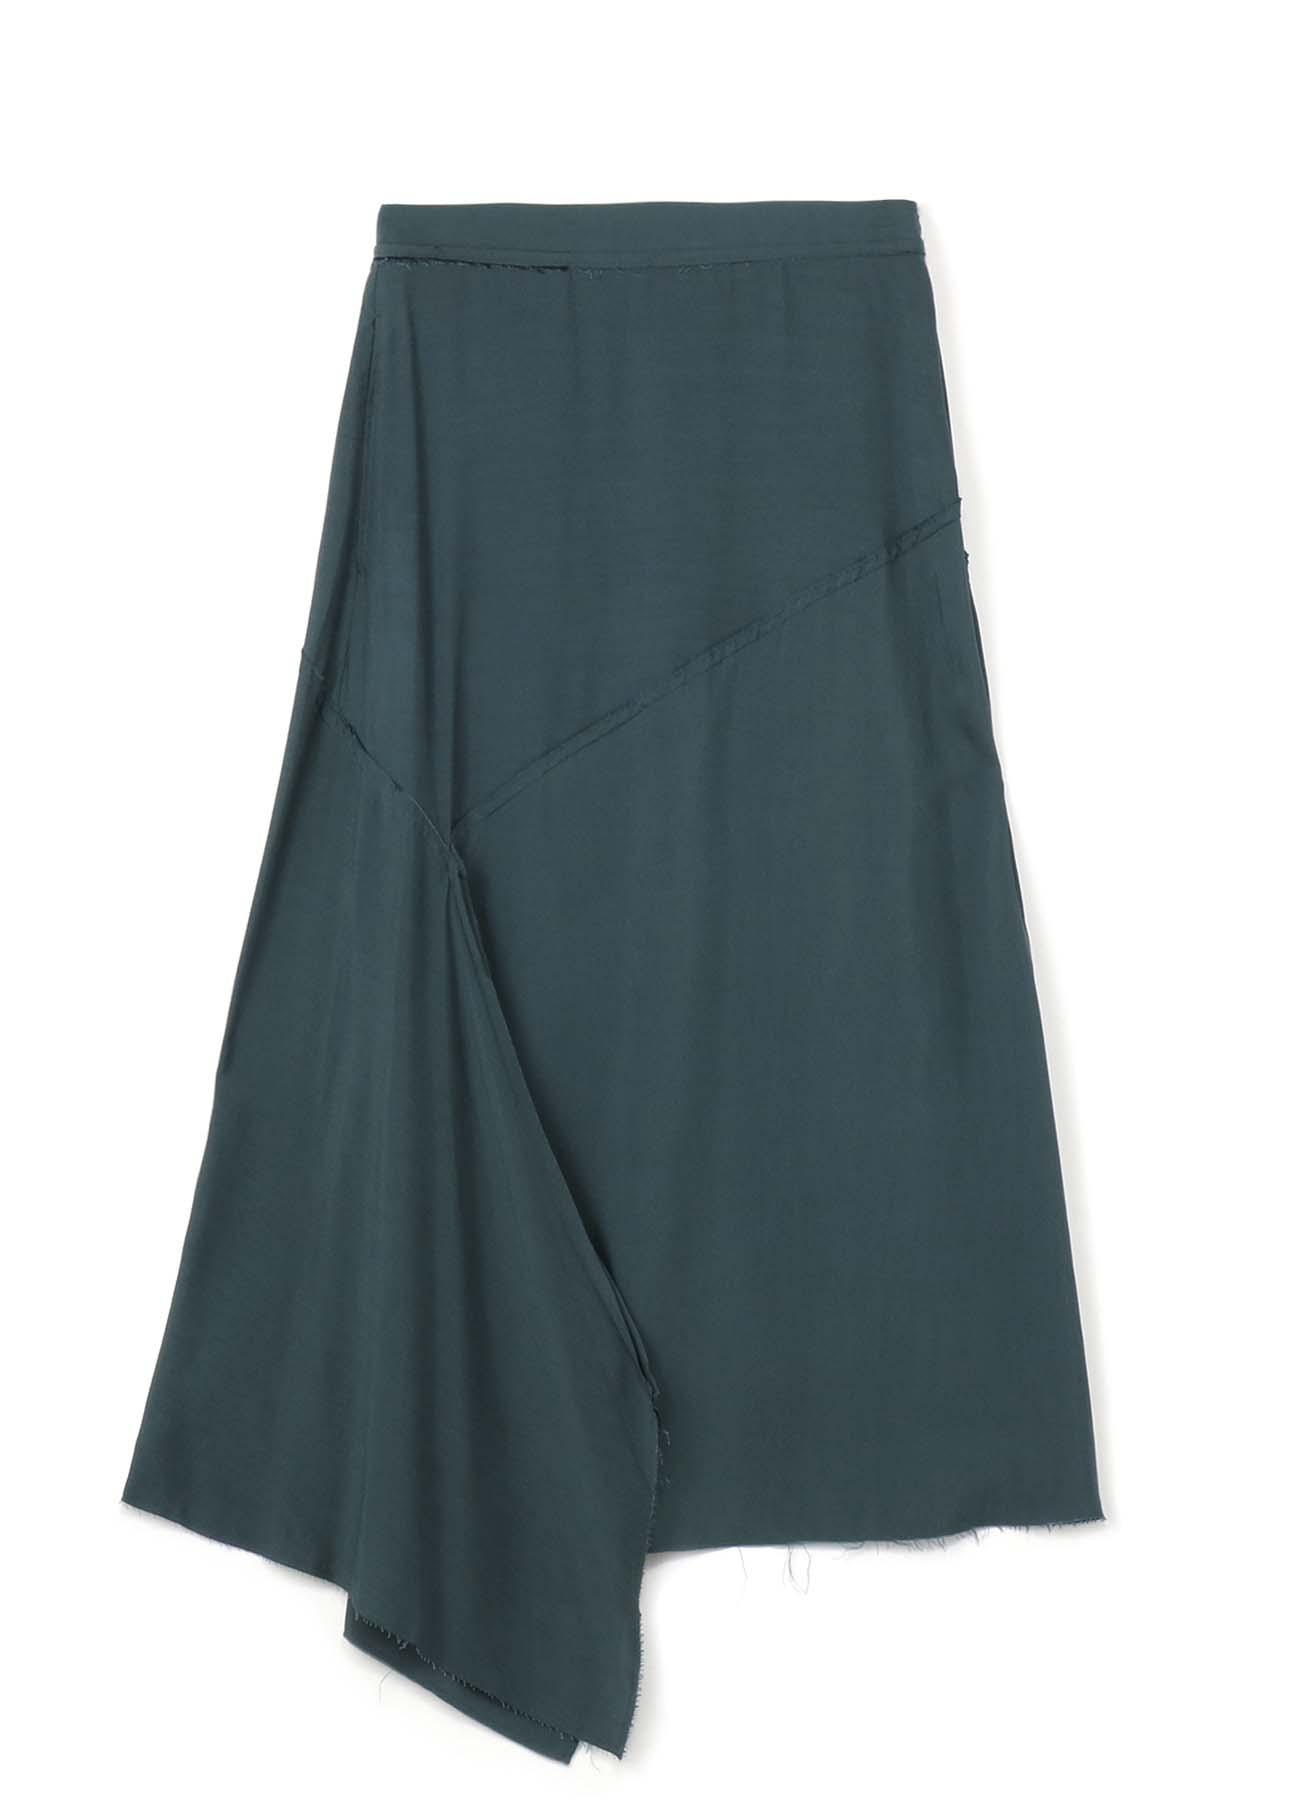 Y'sPINK 人造丝非对称拼接半身裙